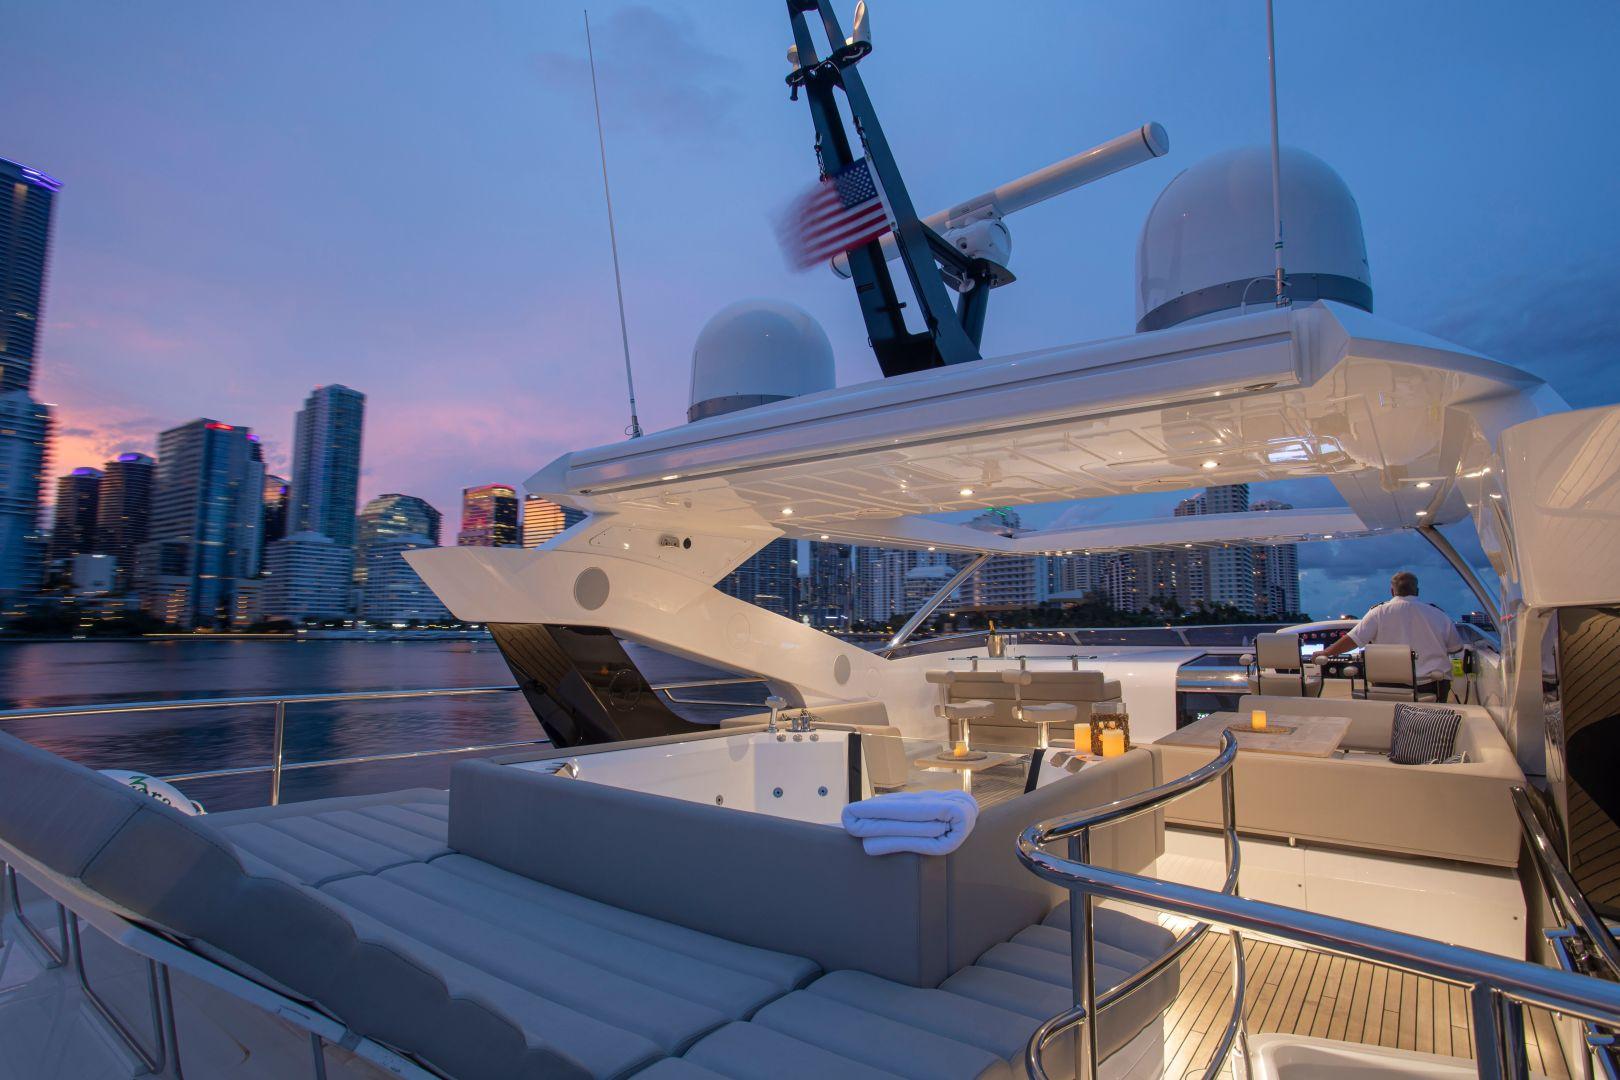 Sunseeker-95 Yacht 2017-Perseverance 3 Ft Lauderdale-Florida-United States-1400118   Thumbnail